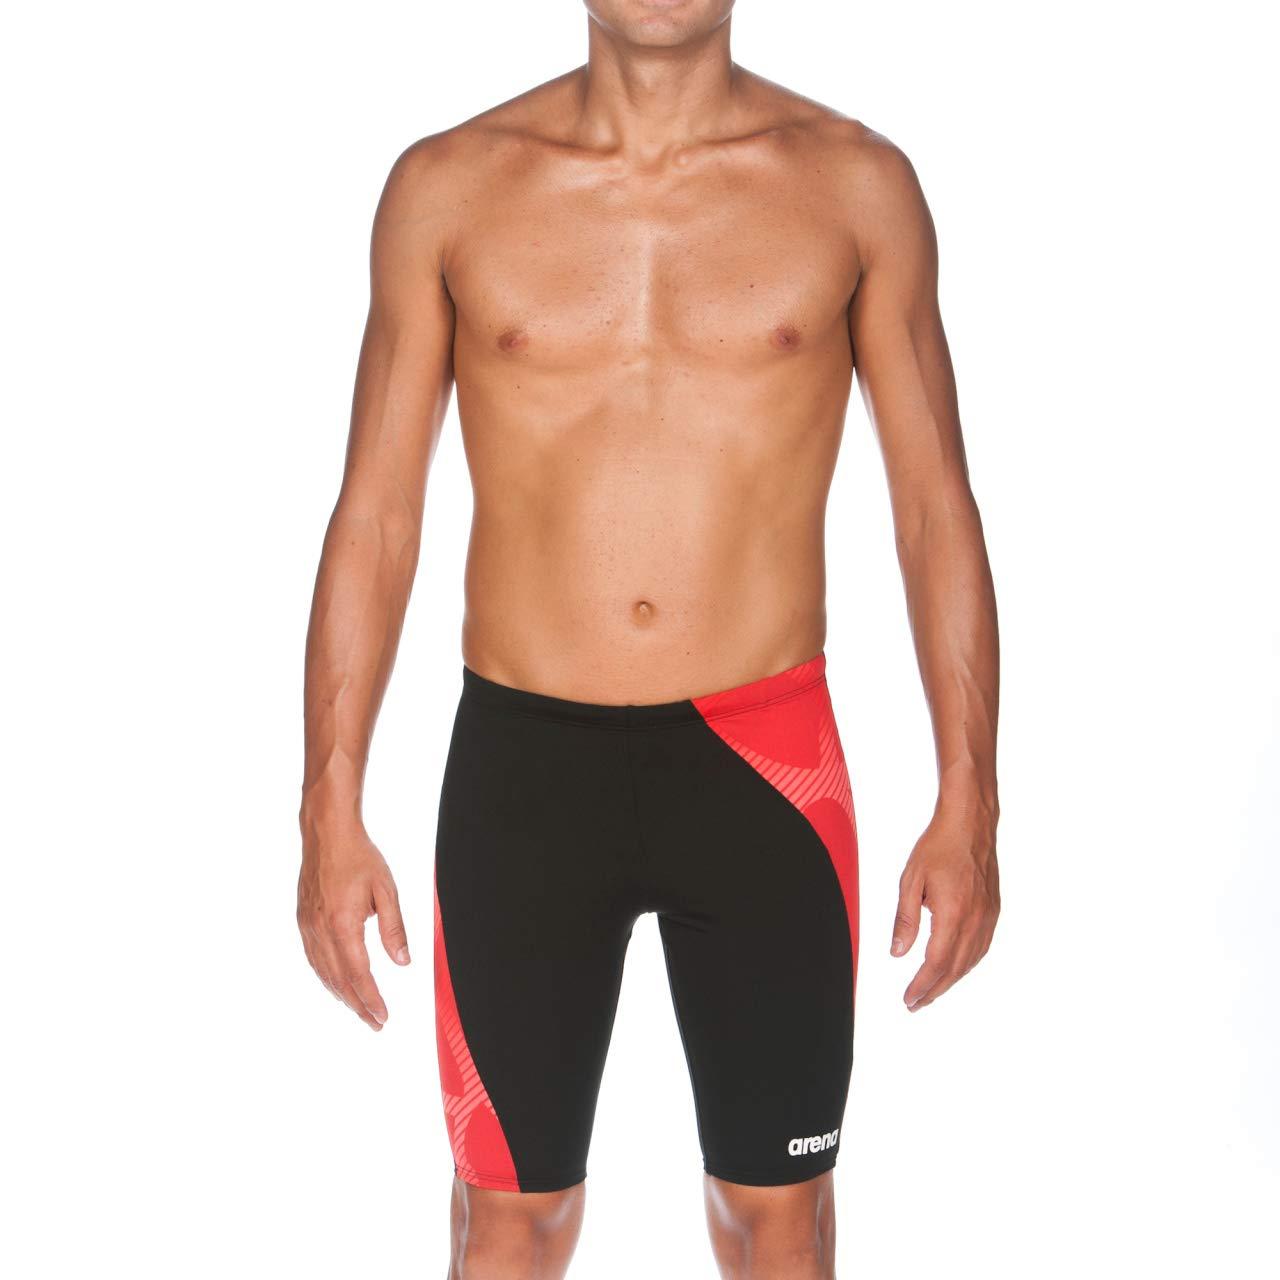 ARENA Spider MaxLife Panel Jammer Swimsuit